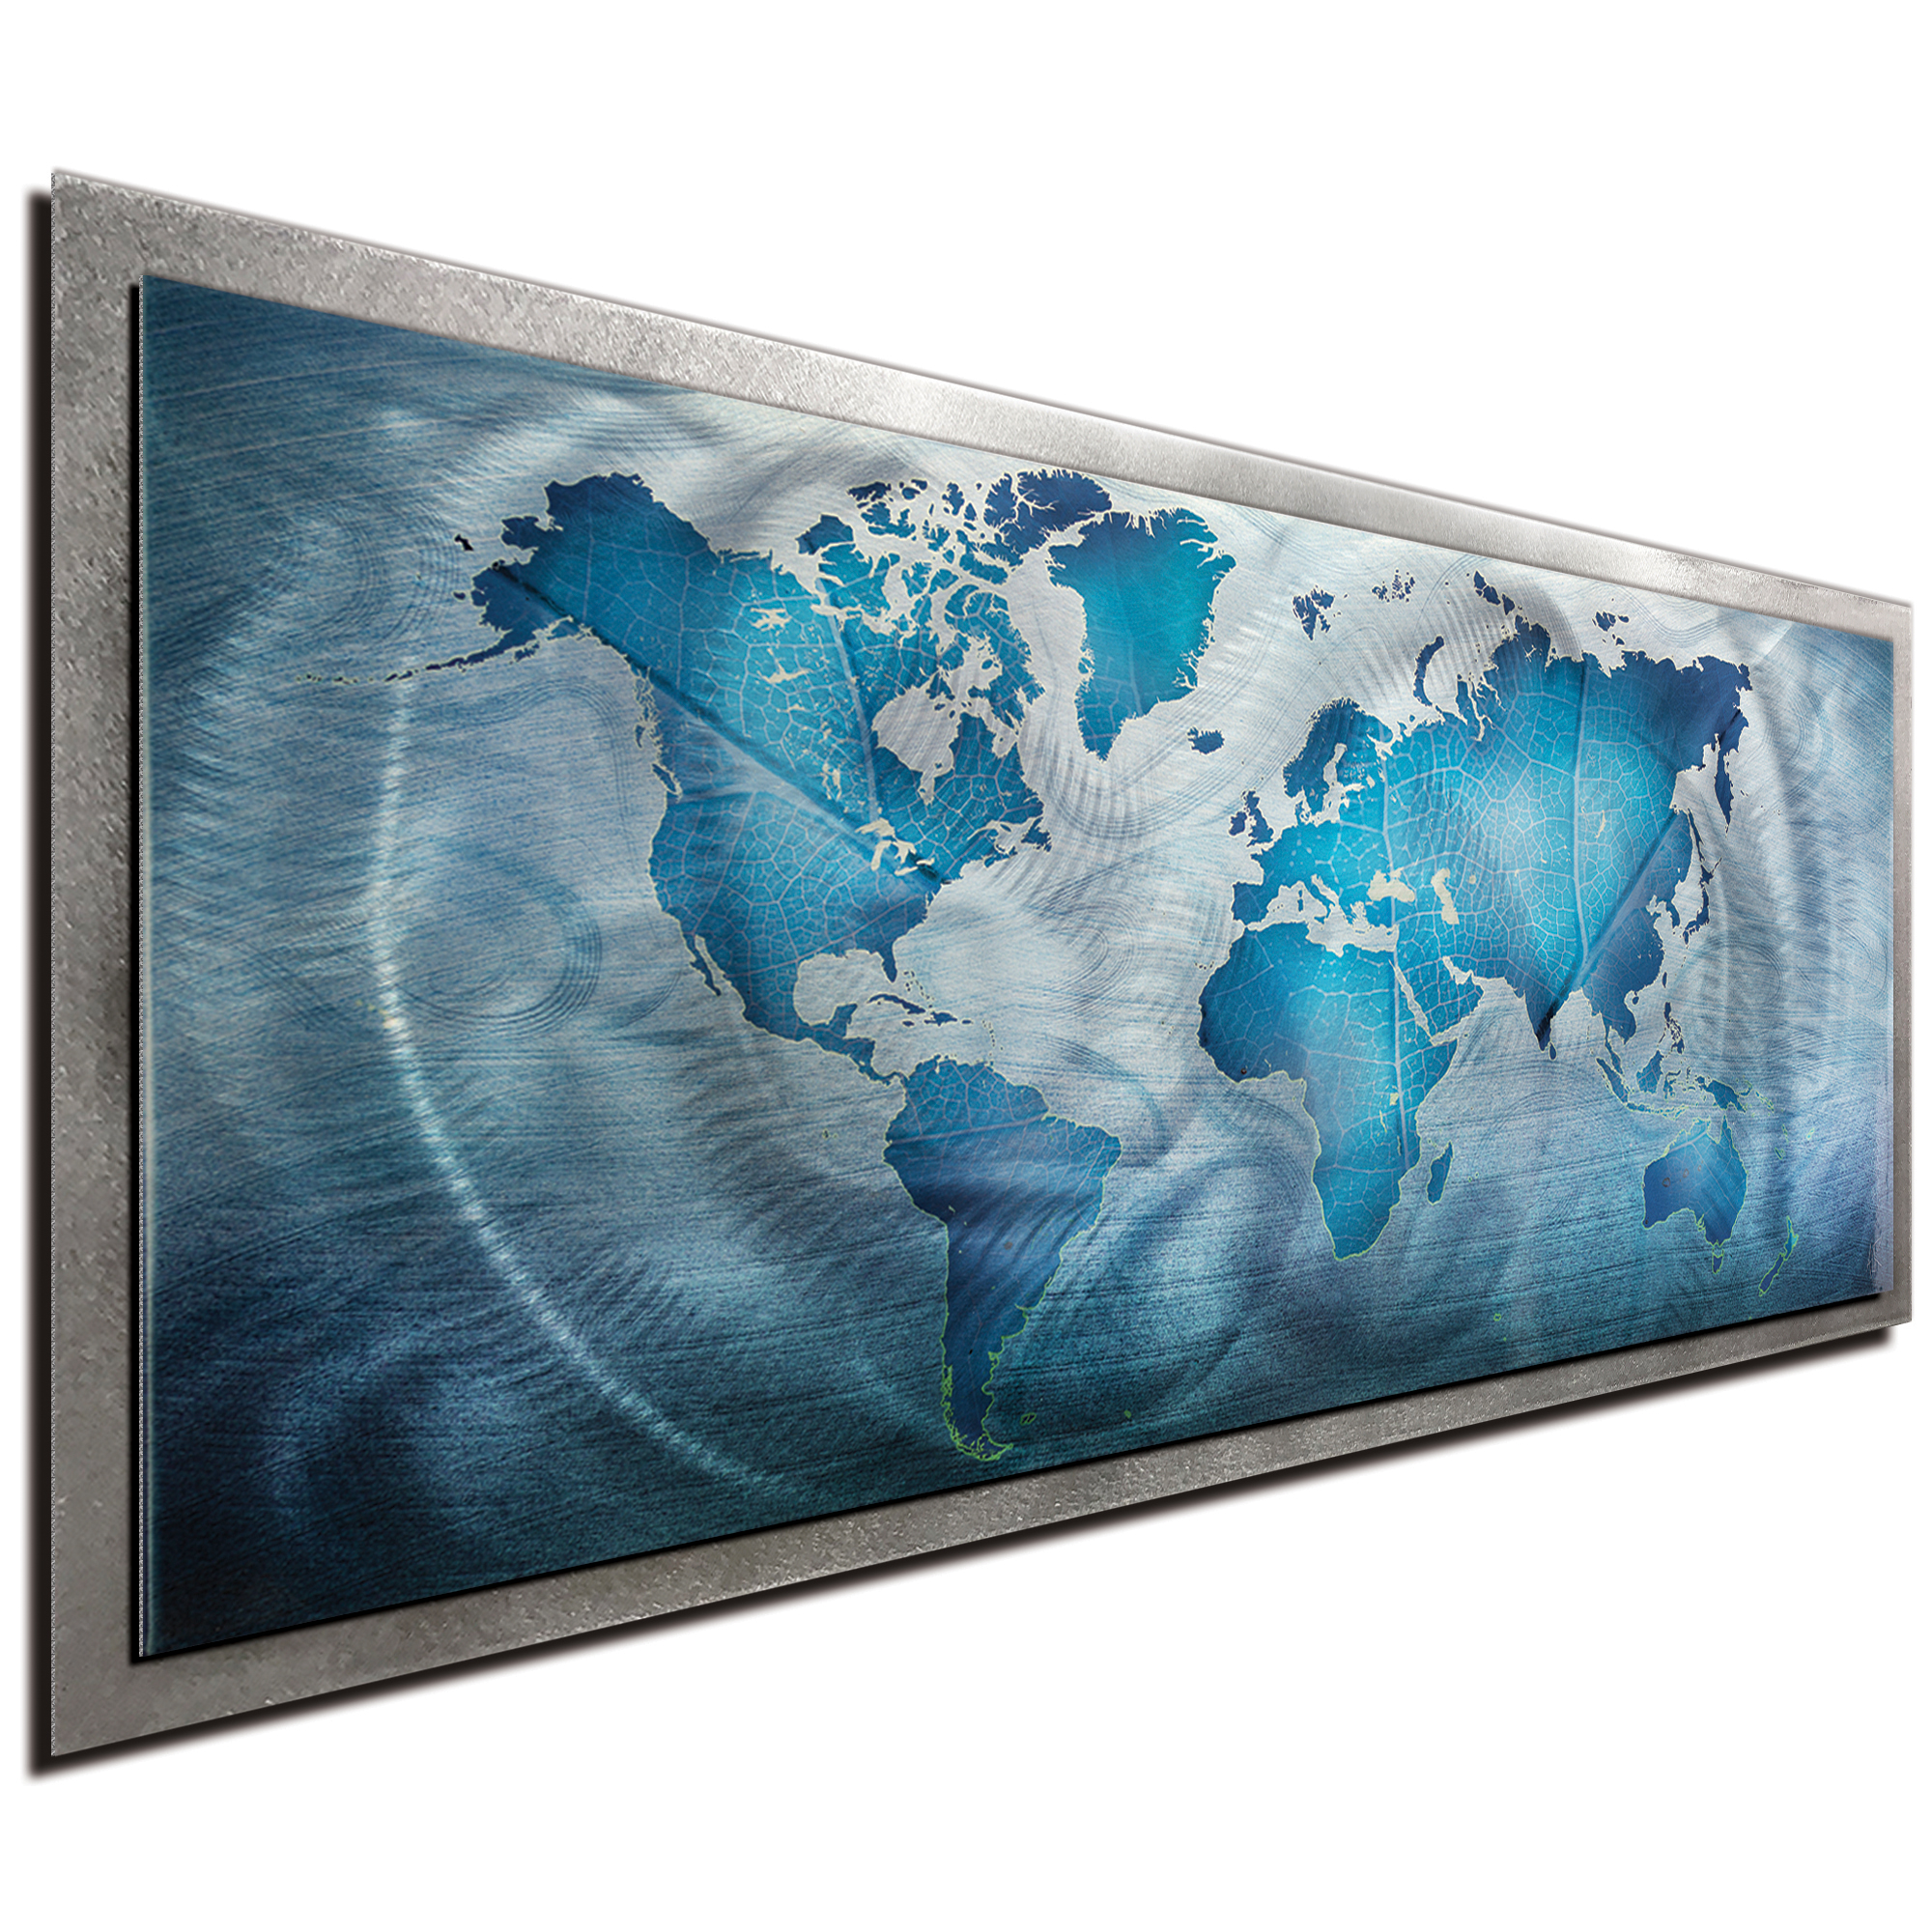 Land and Sea Framed - Image 2